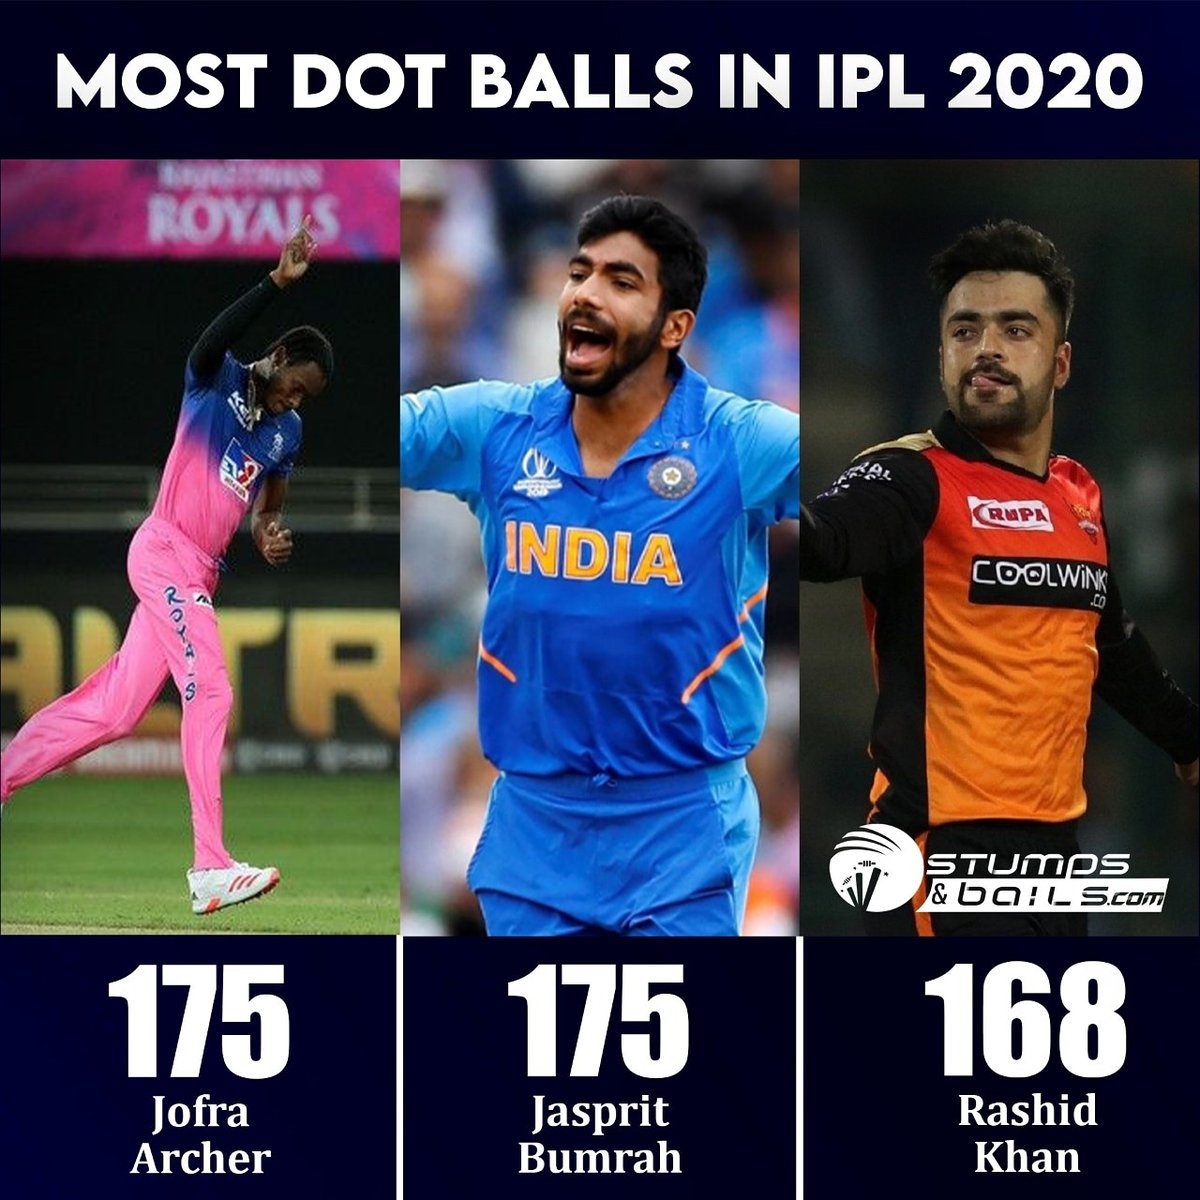 Best bowlers in #IPL2020 🤩 #JofraArcher #Jaspritbumrah #RashidKhan  Follow us @stumpnbails #IPL2020finals #IPLinUAE #IPLFinals #dream11iplfinal #Dream11IPL2020 #MI #DC #MIvsDC #DCvMI #MumbaiIndians #DelhiCapitals #RohitSharma #RR #SRH